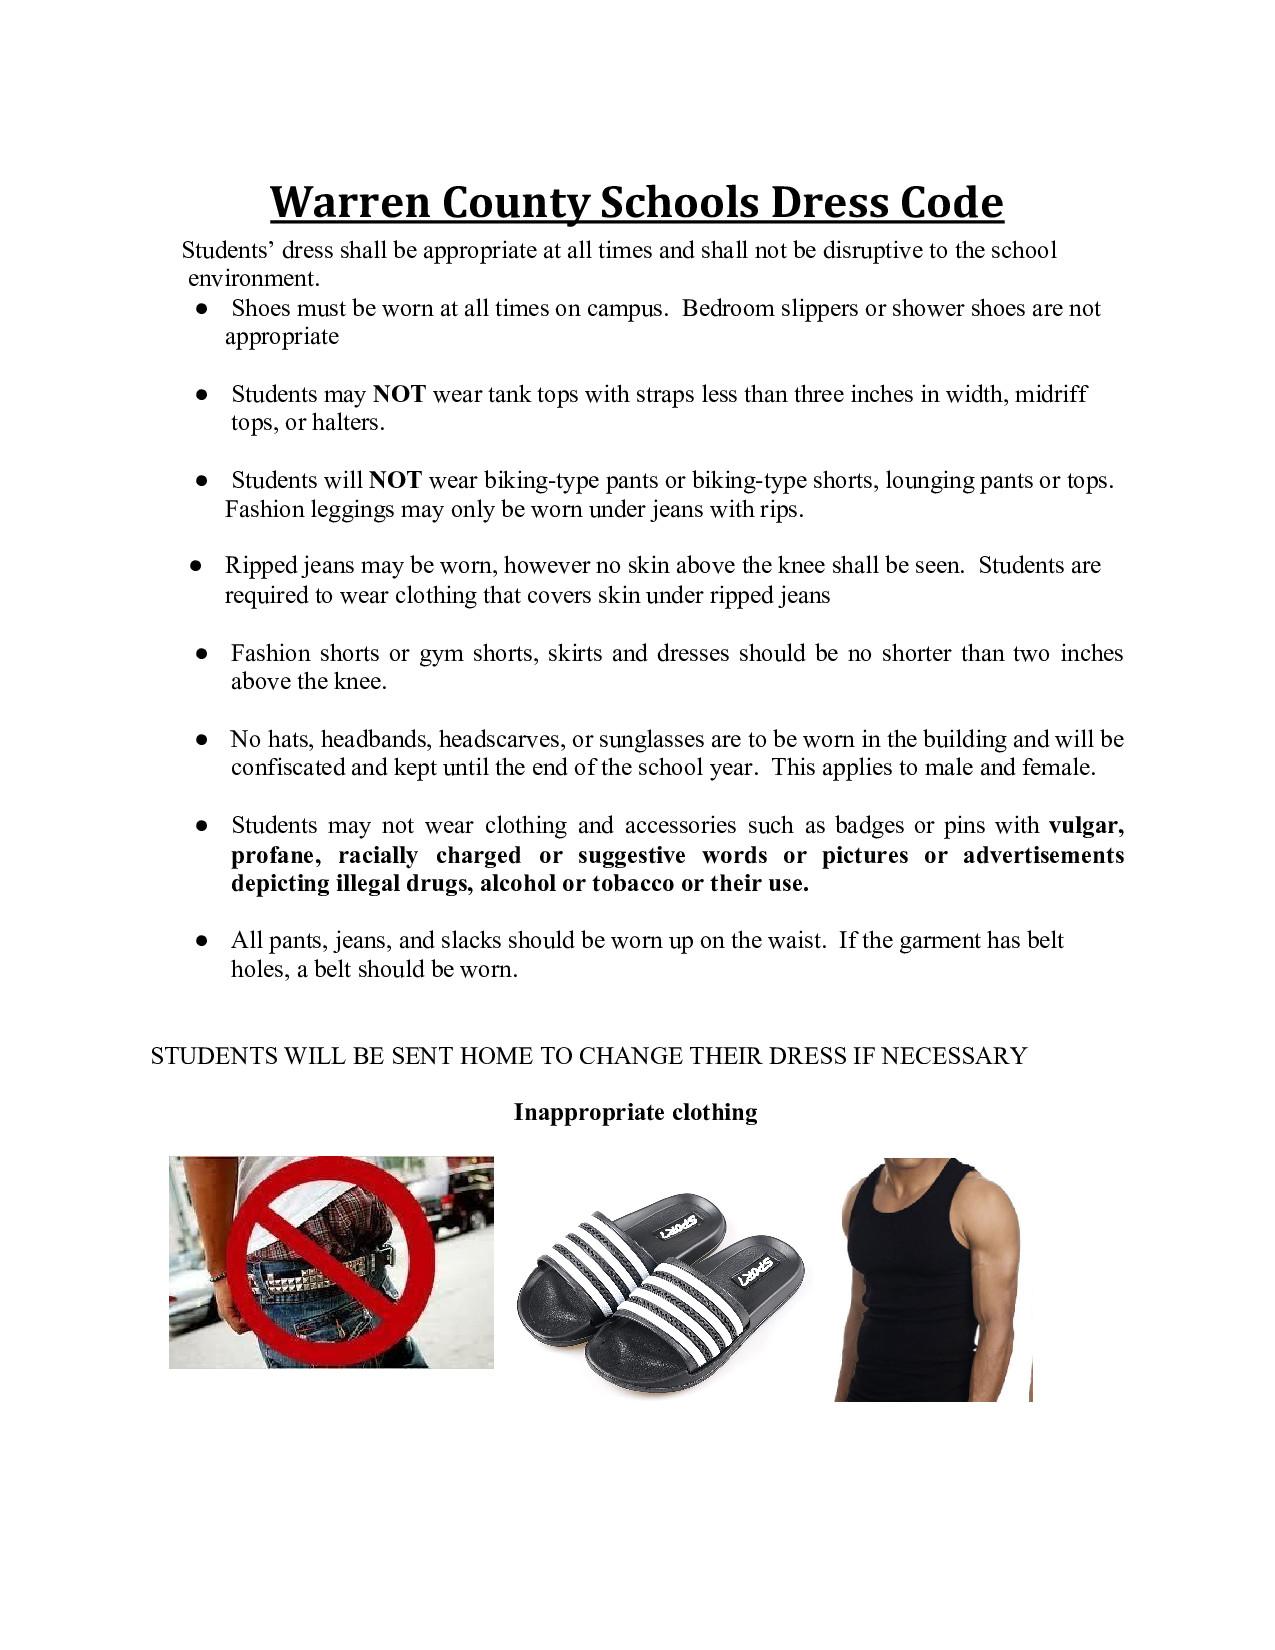 Warren County Dress Code